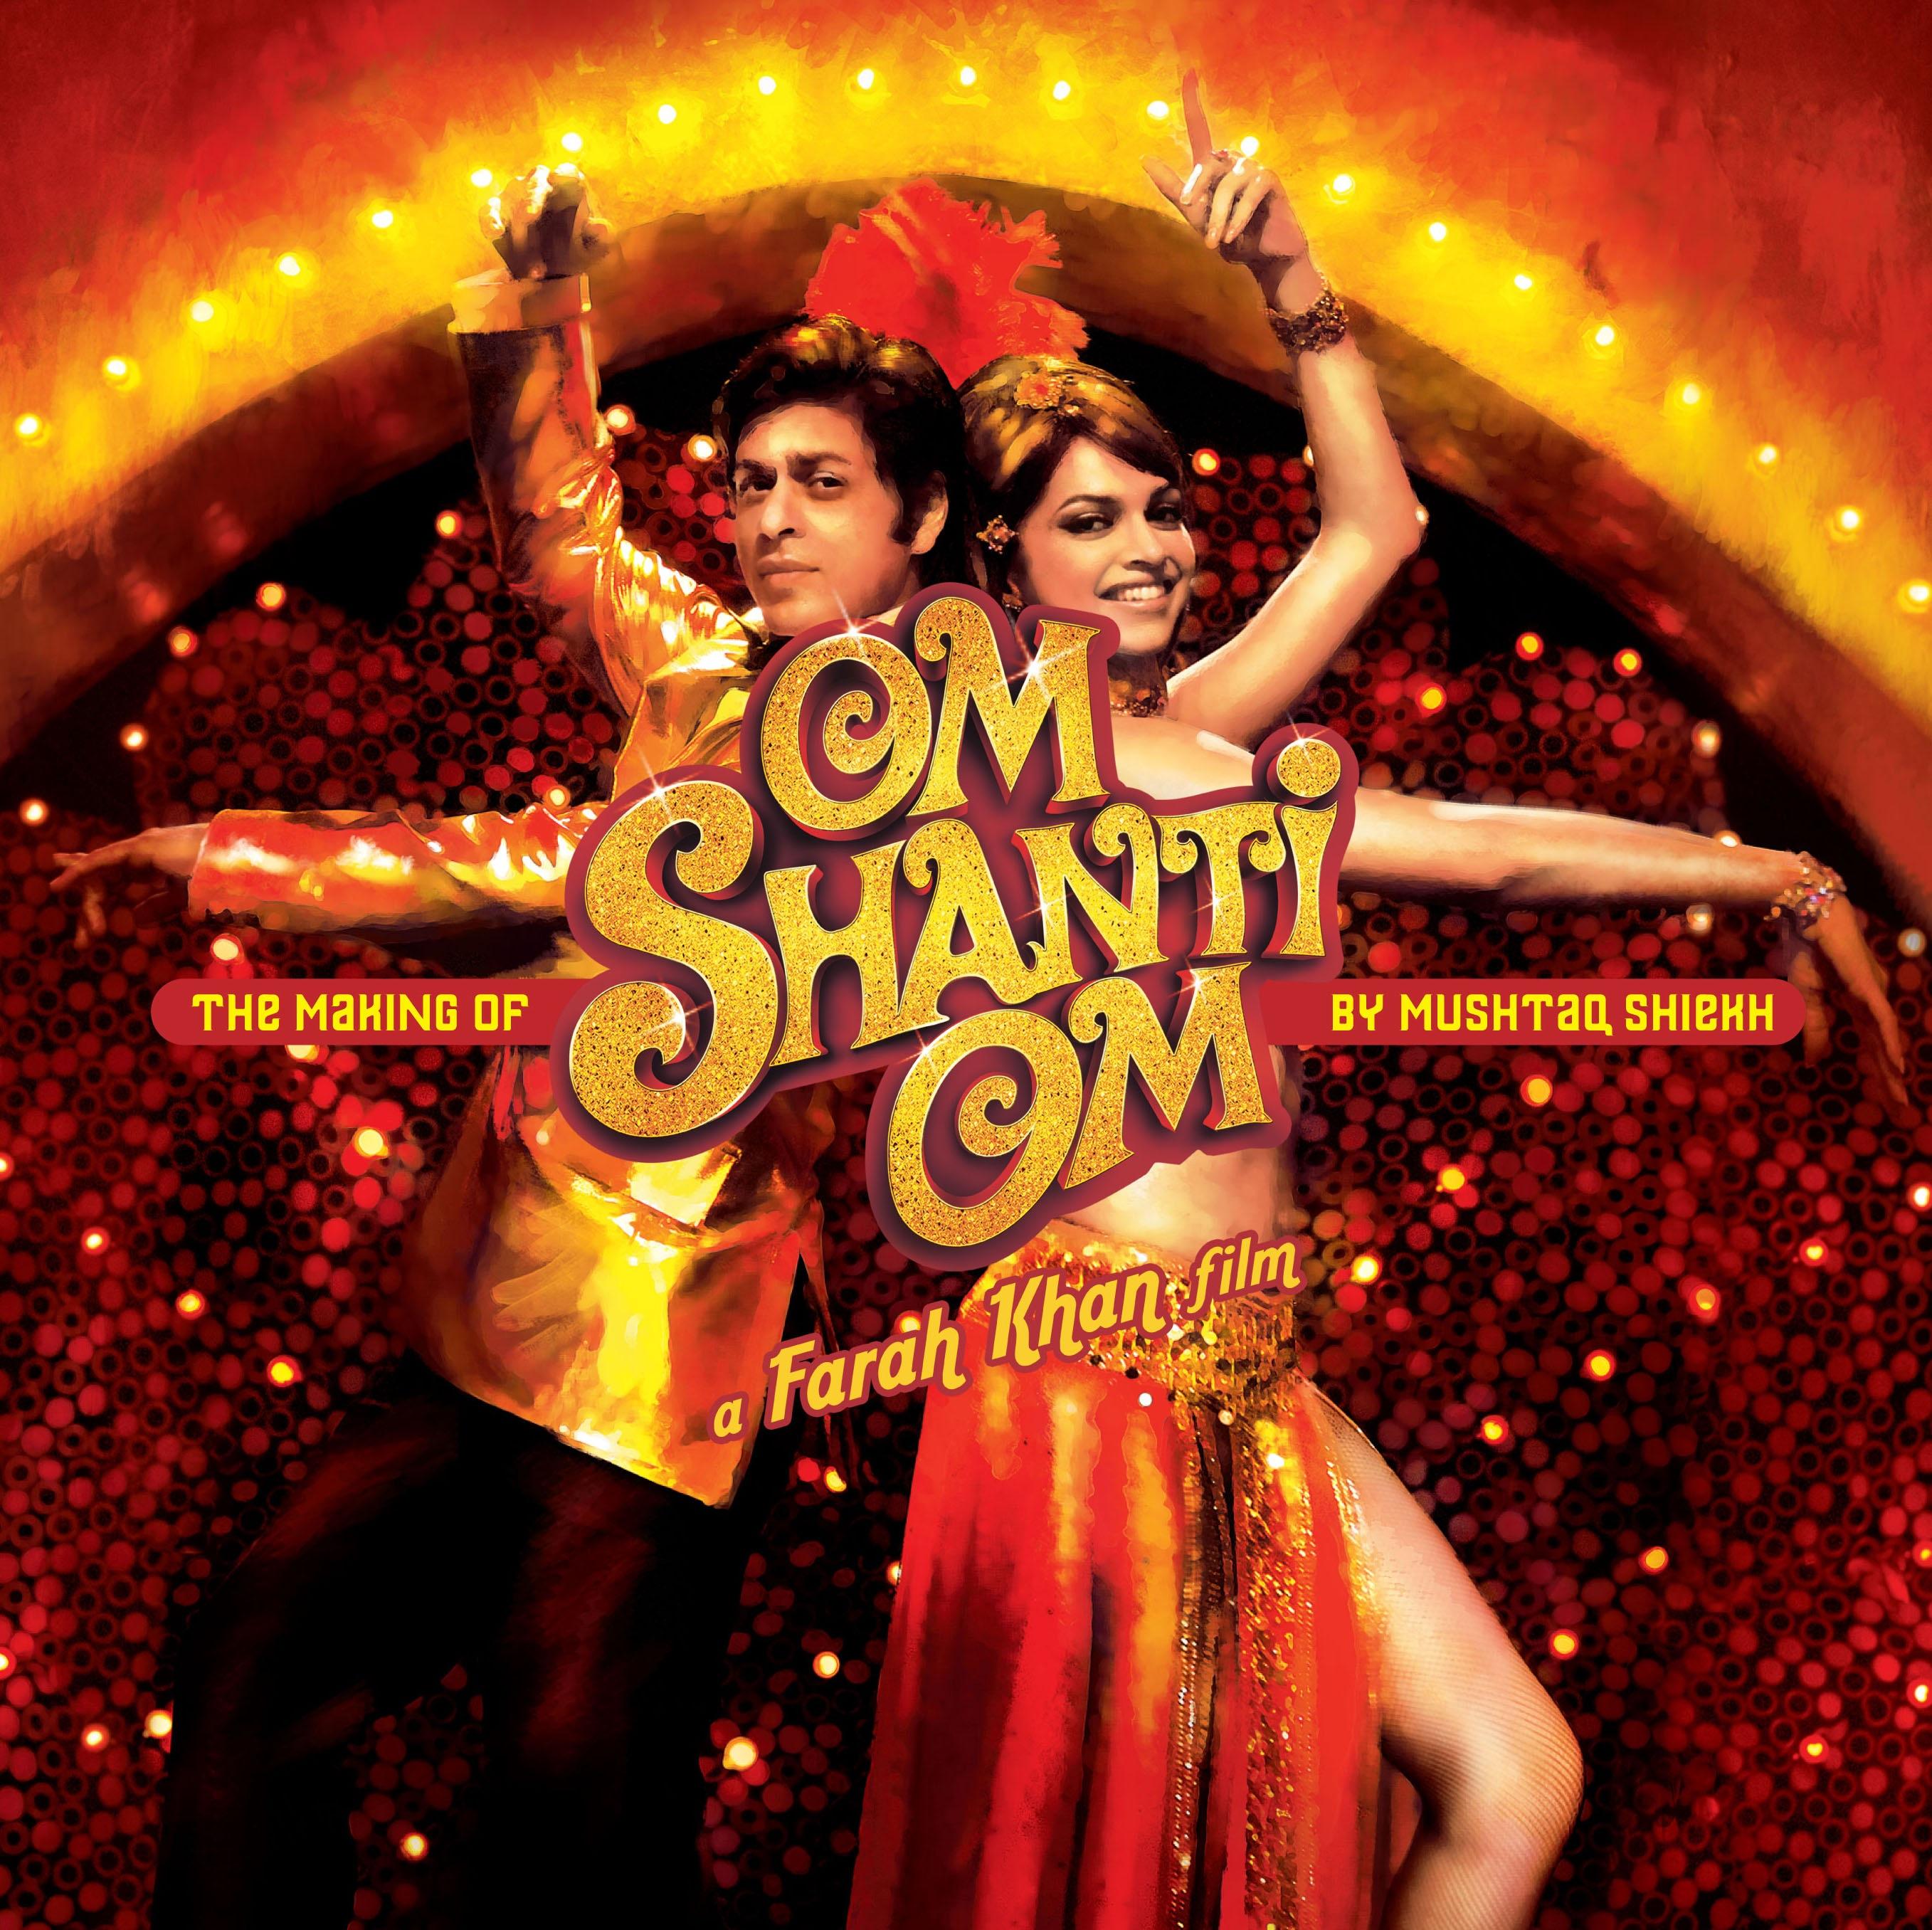 The Making Of Om Shanti Om A Farah Khan Film Photos